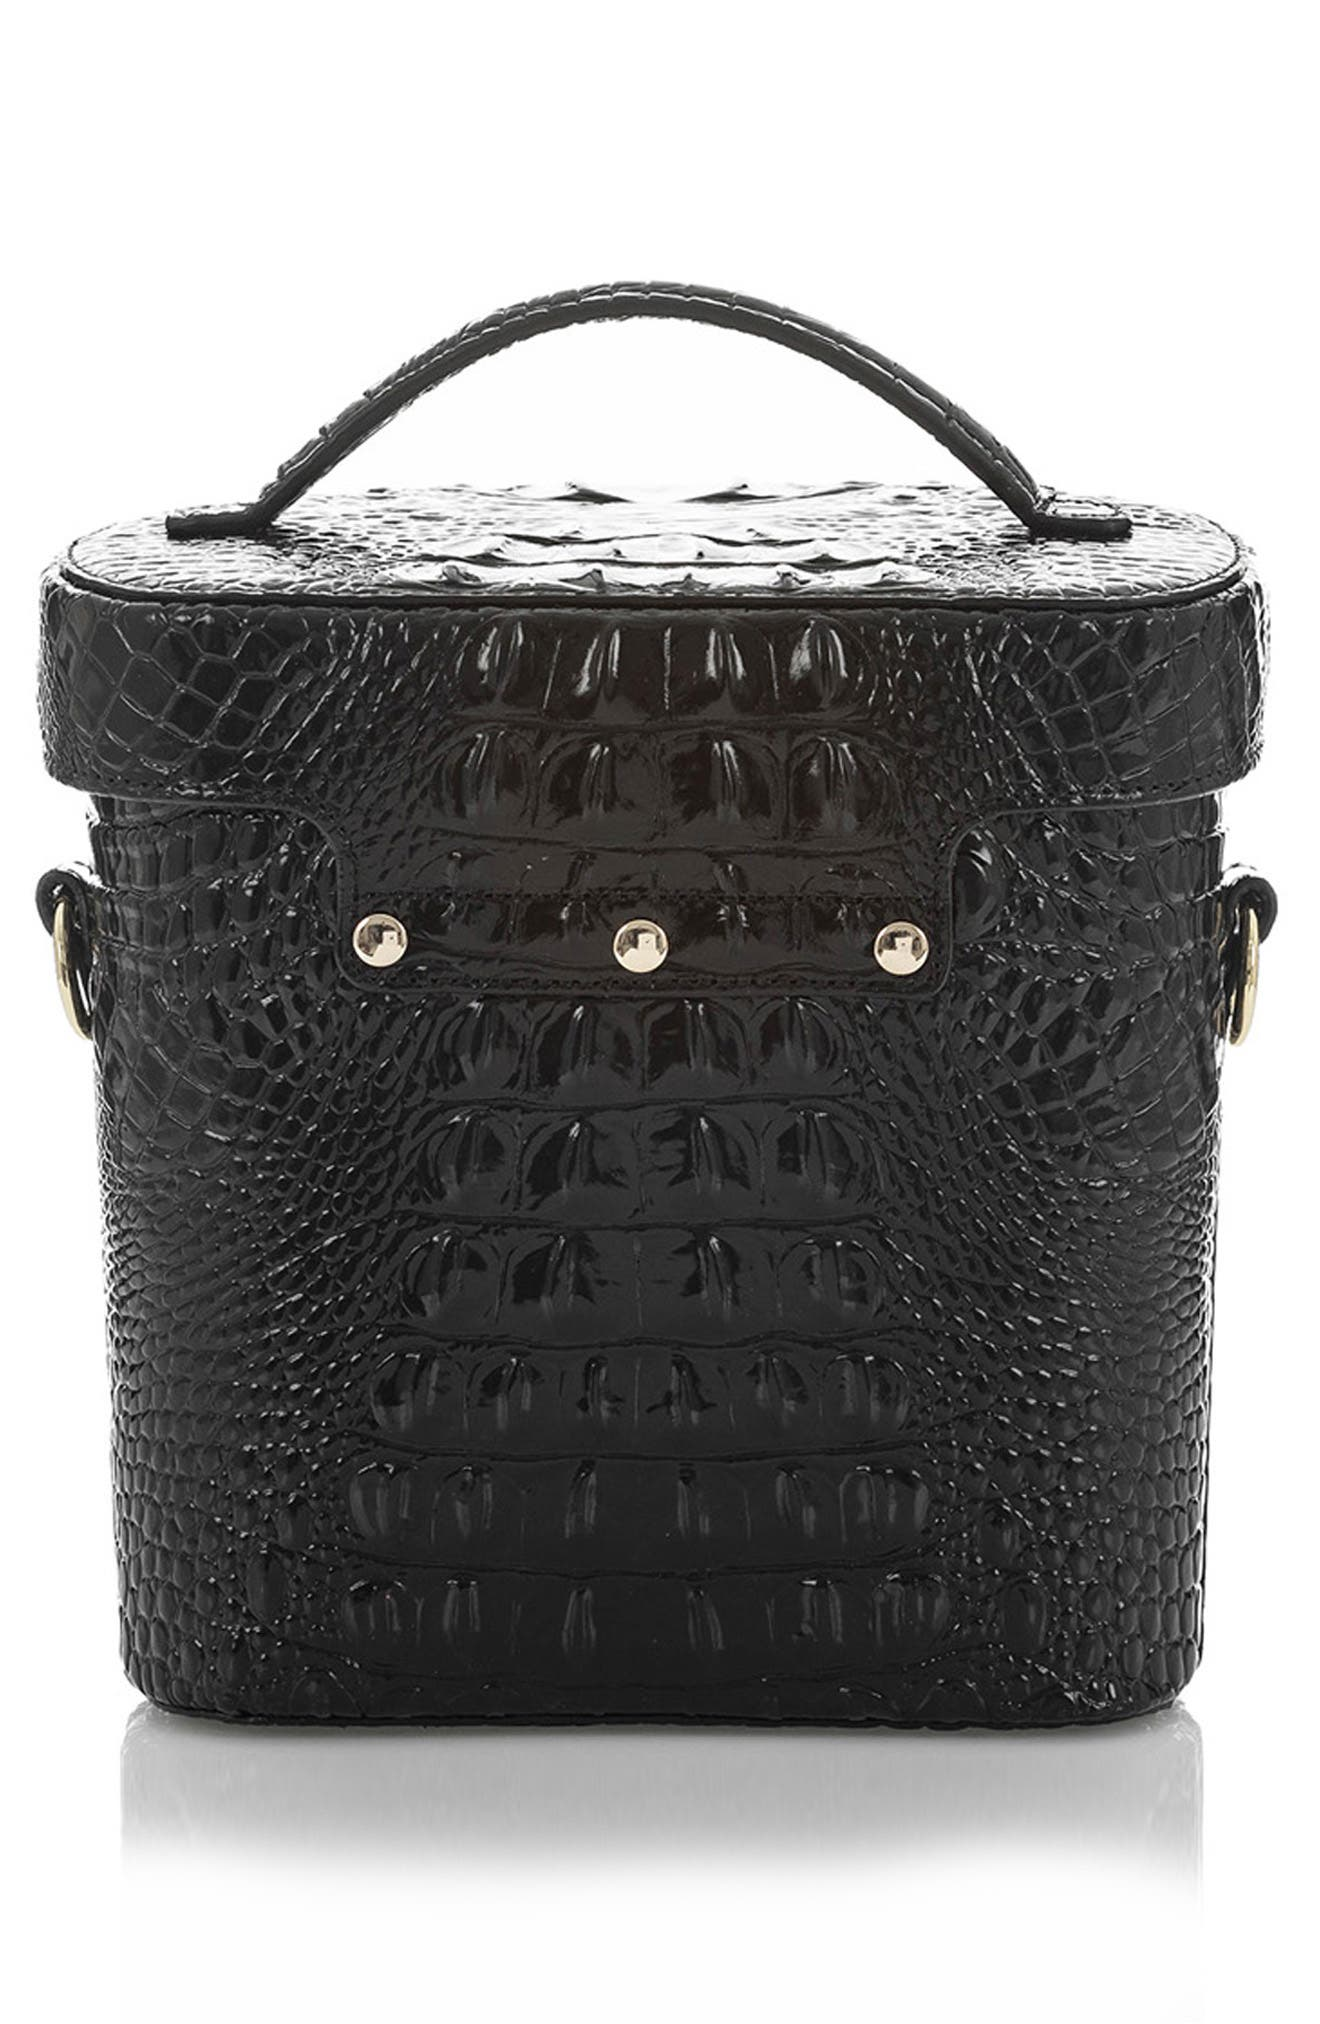 BRAHMIN, Pipp Croc Embossed Leather Top Handle Bag, Alternate thumbnail 2, color, BLACK MEMBOURNE